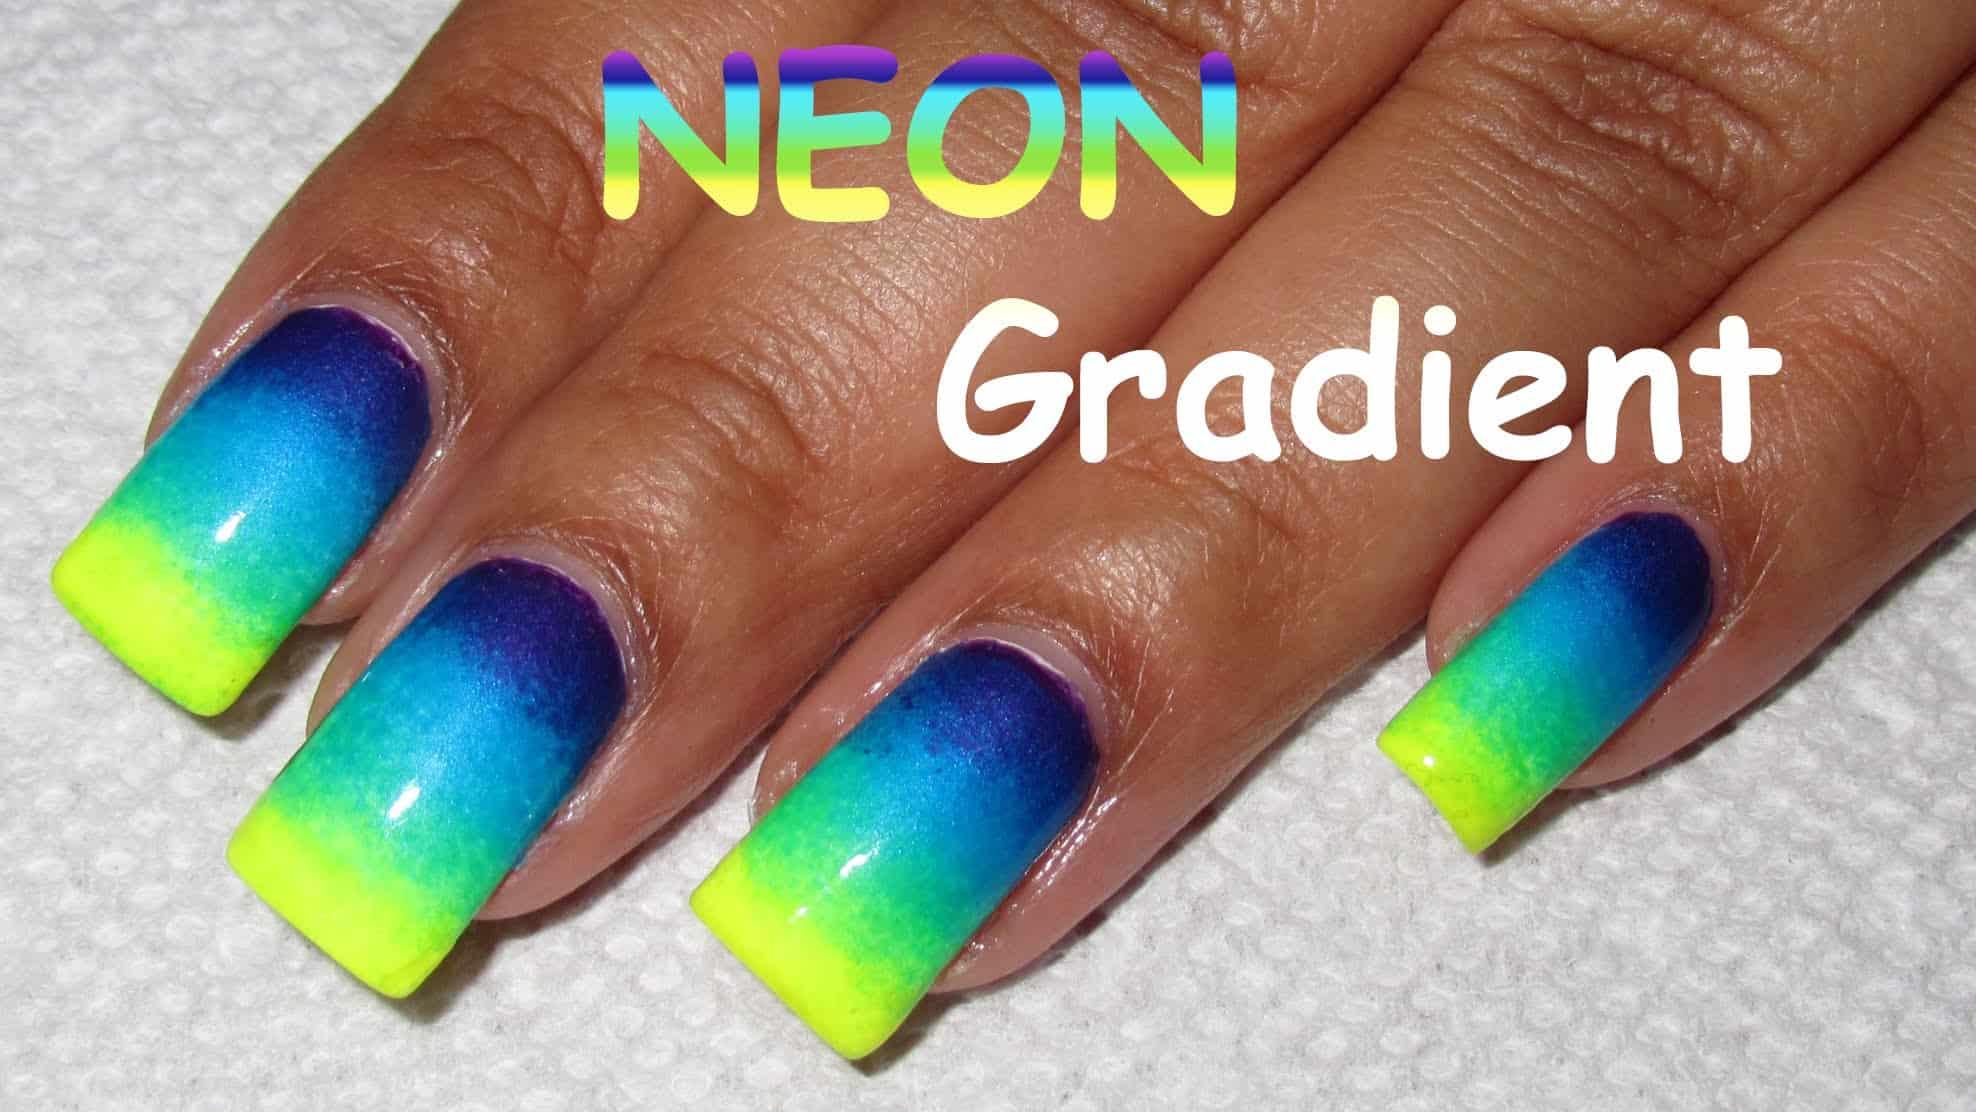 Gradient neon nails